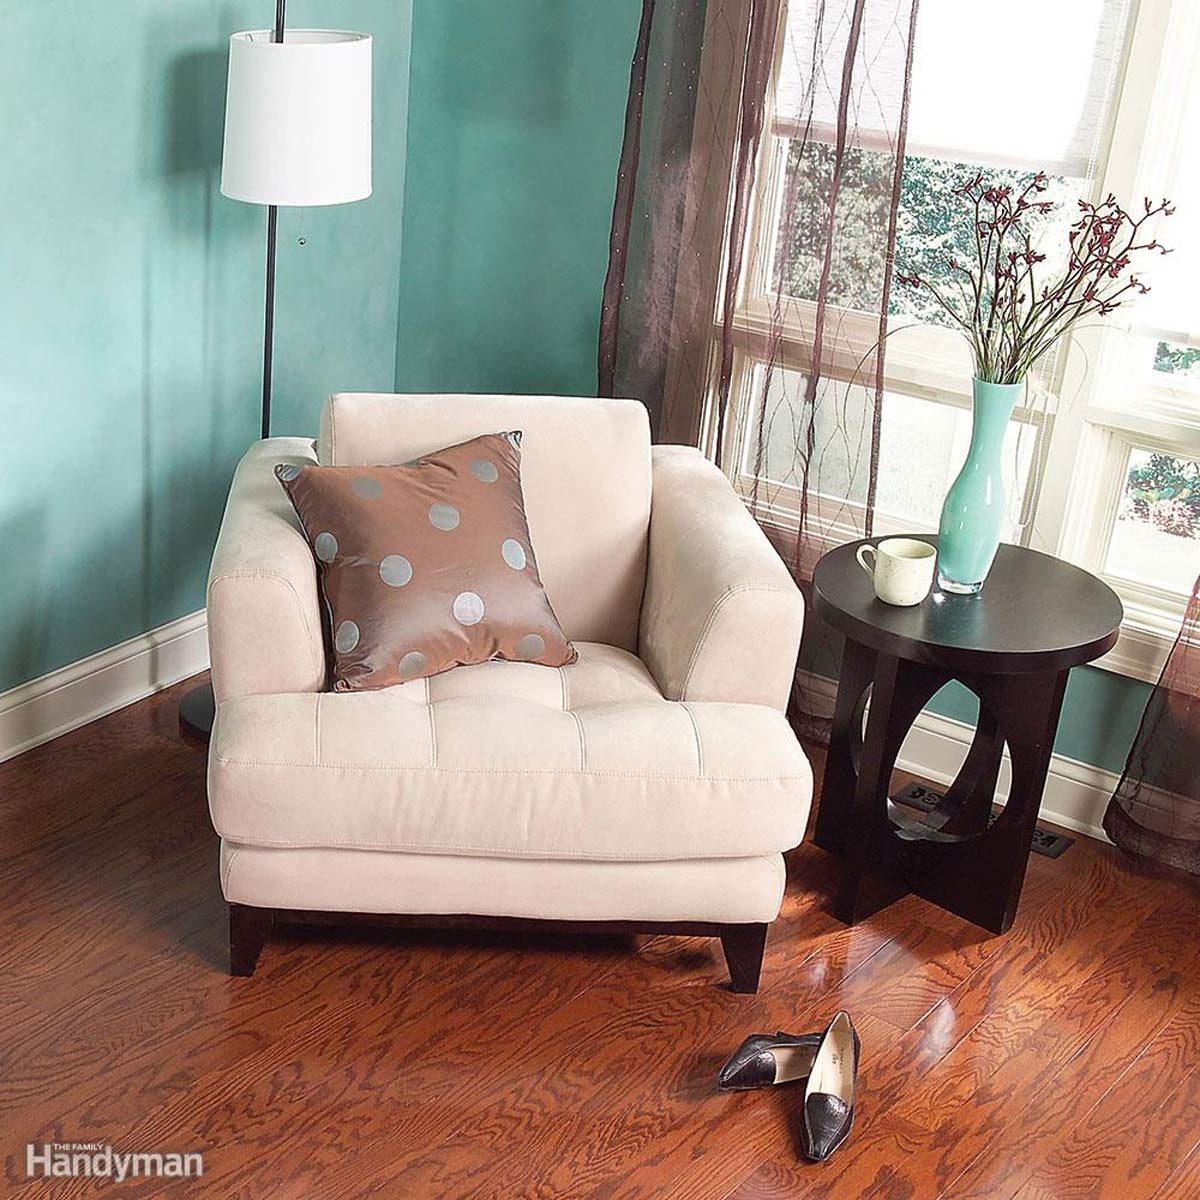 Rearrange Your Furniture